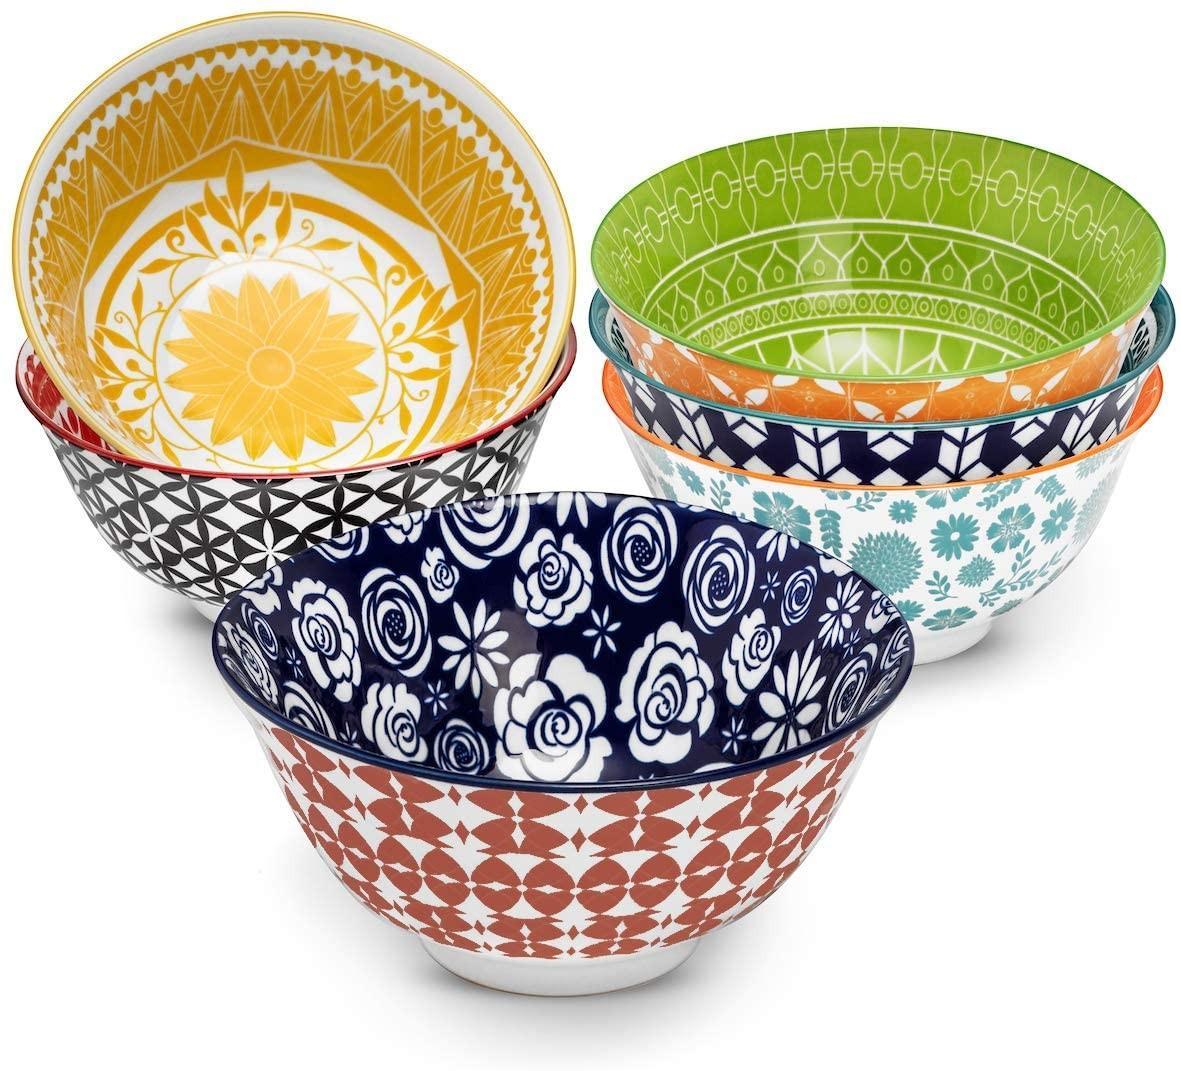 annovero porcelain bowls